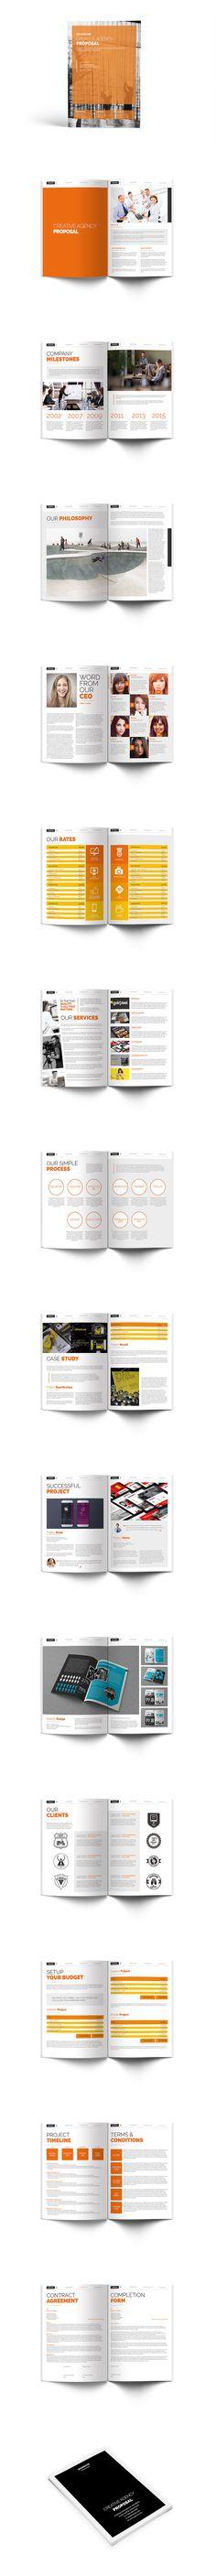 Proposal Brochure Template InDesign INDD - US Letter Size - proposals templates